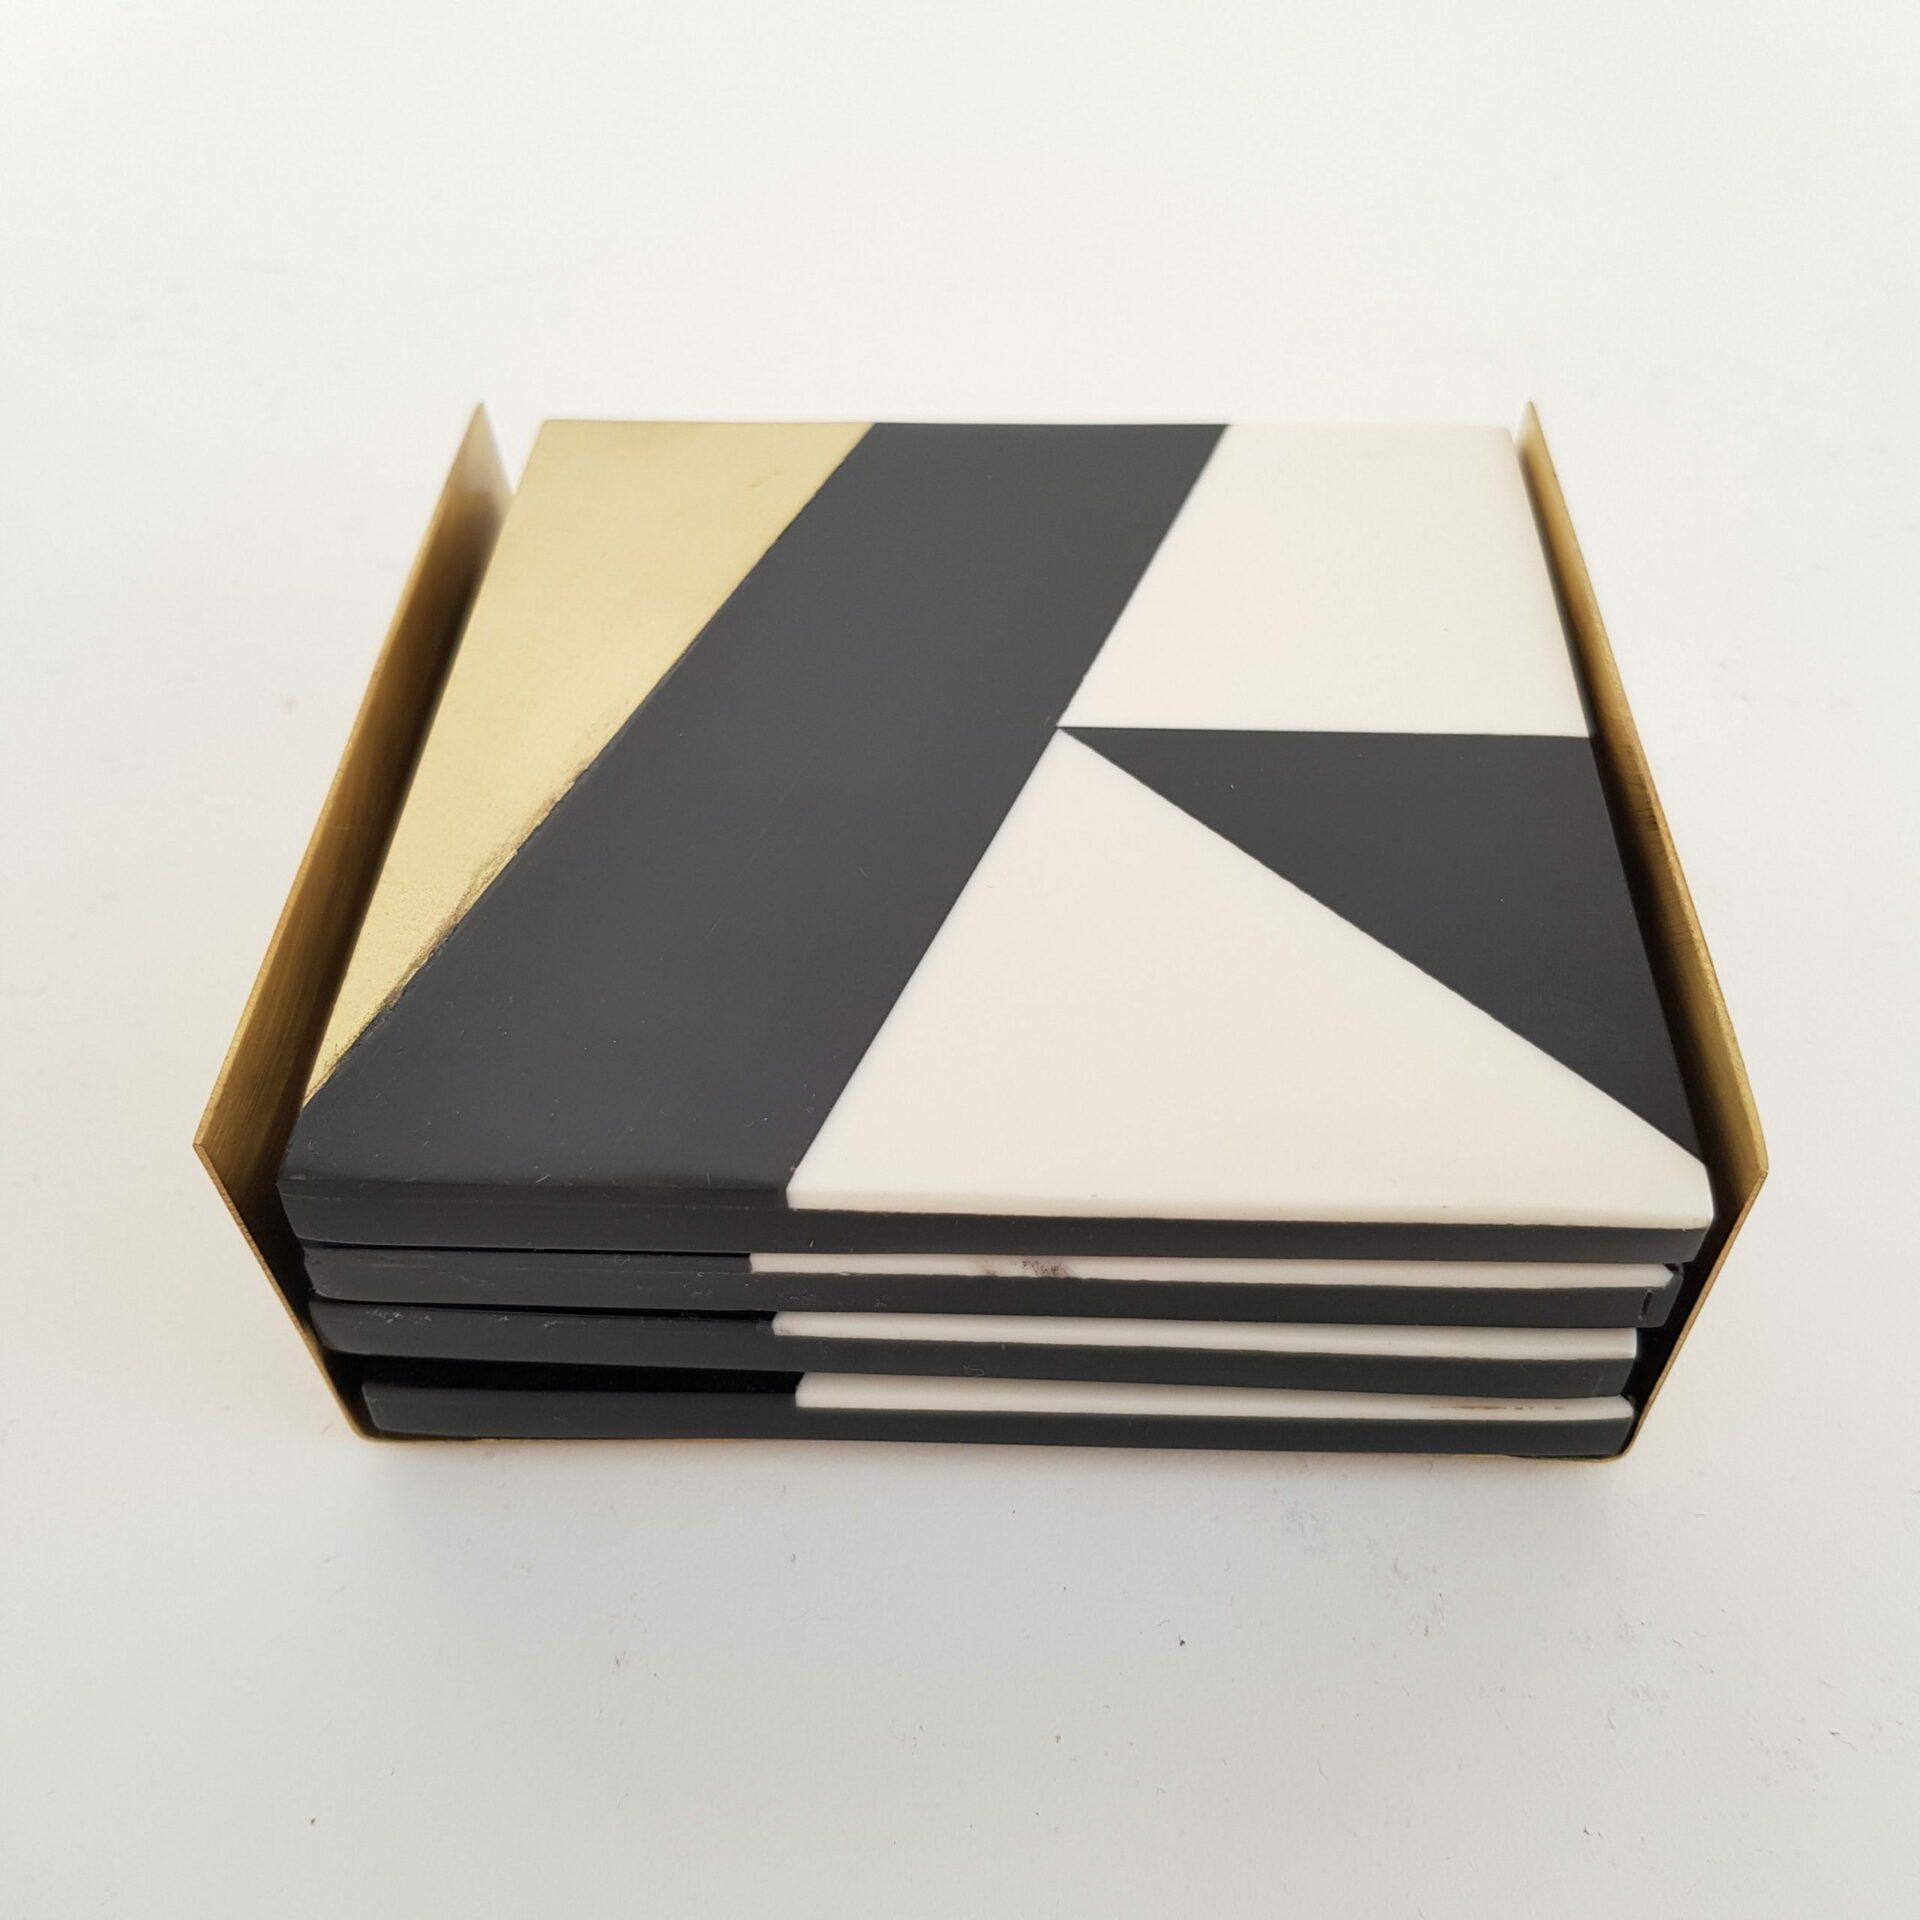 ONDERZETTERS-ARTDECO-GOLD-BLACK